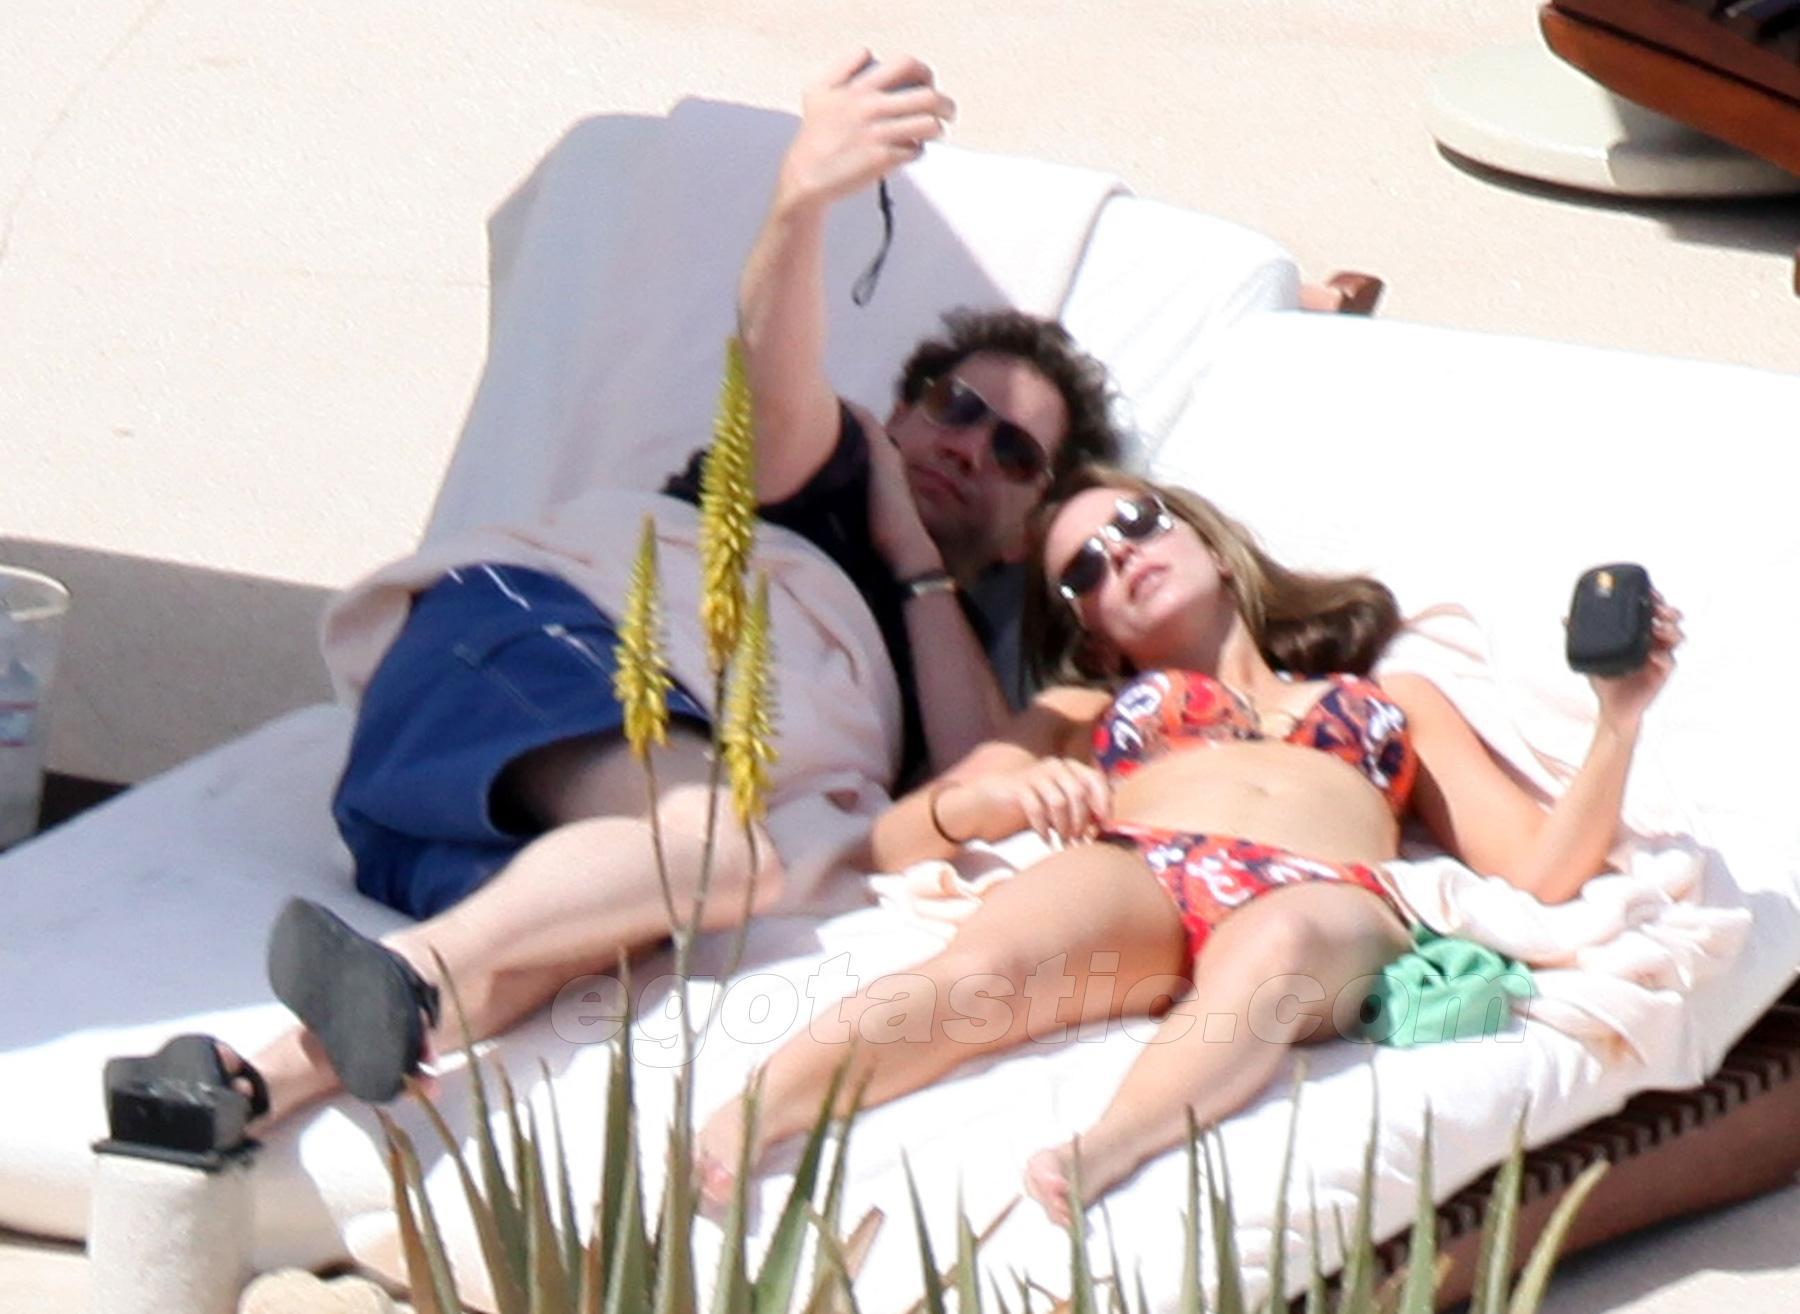 Jennifer Love Hewitt desnuda - Fotos y Vdeos